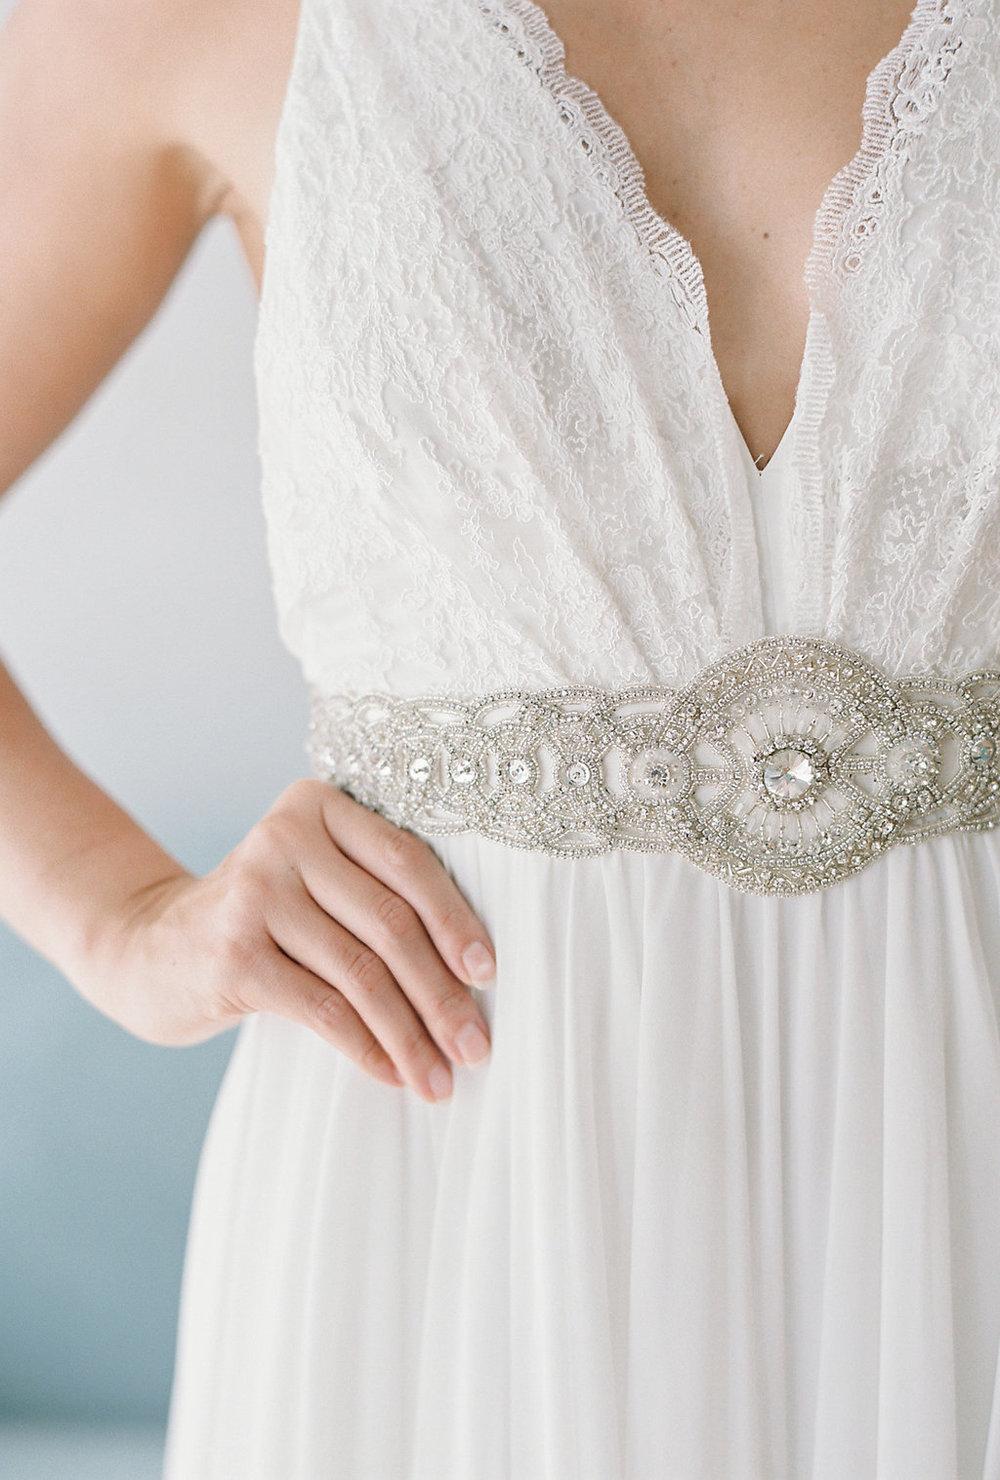 nestina-accessories-lookbook-029.jpg